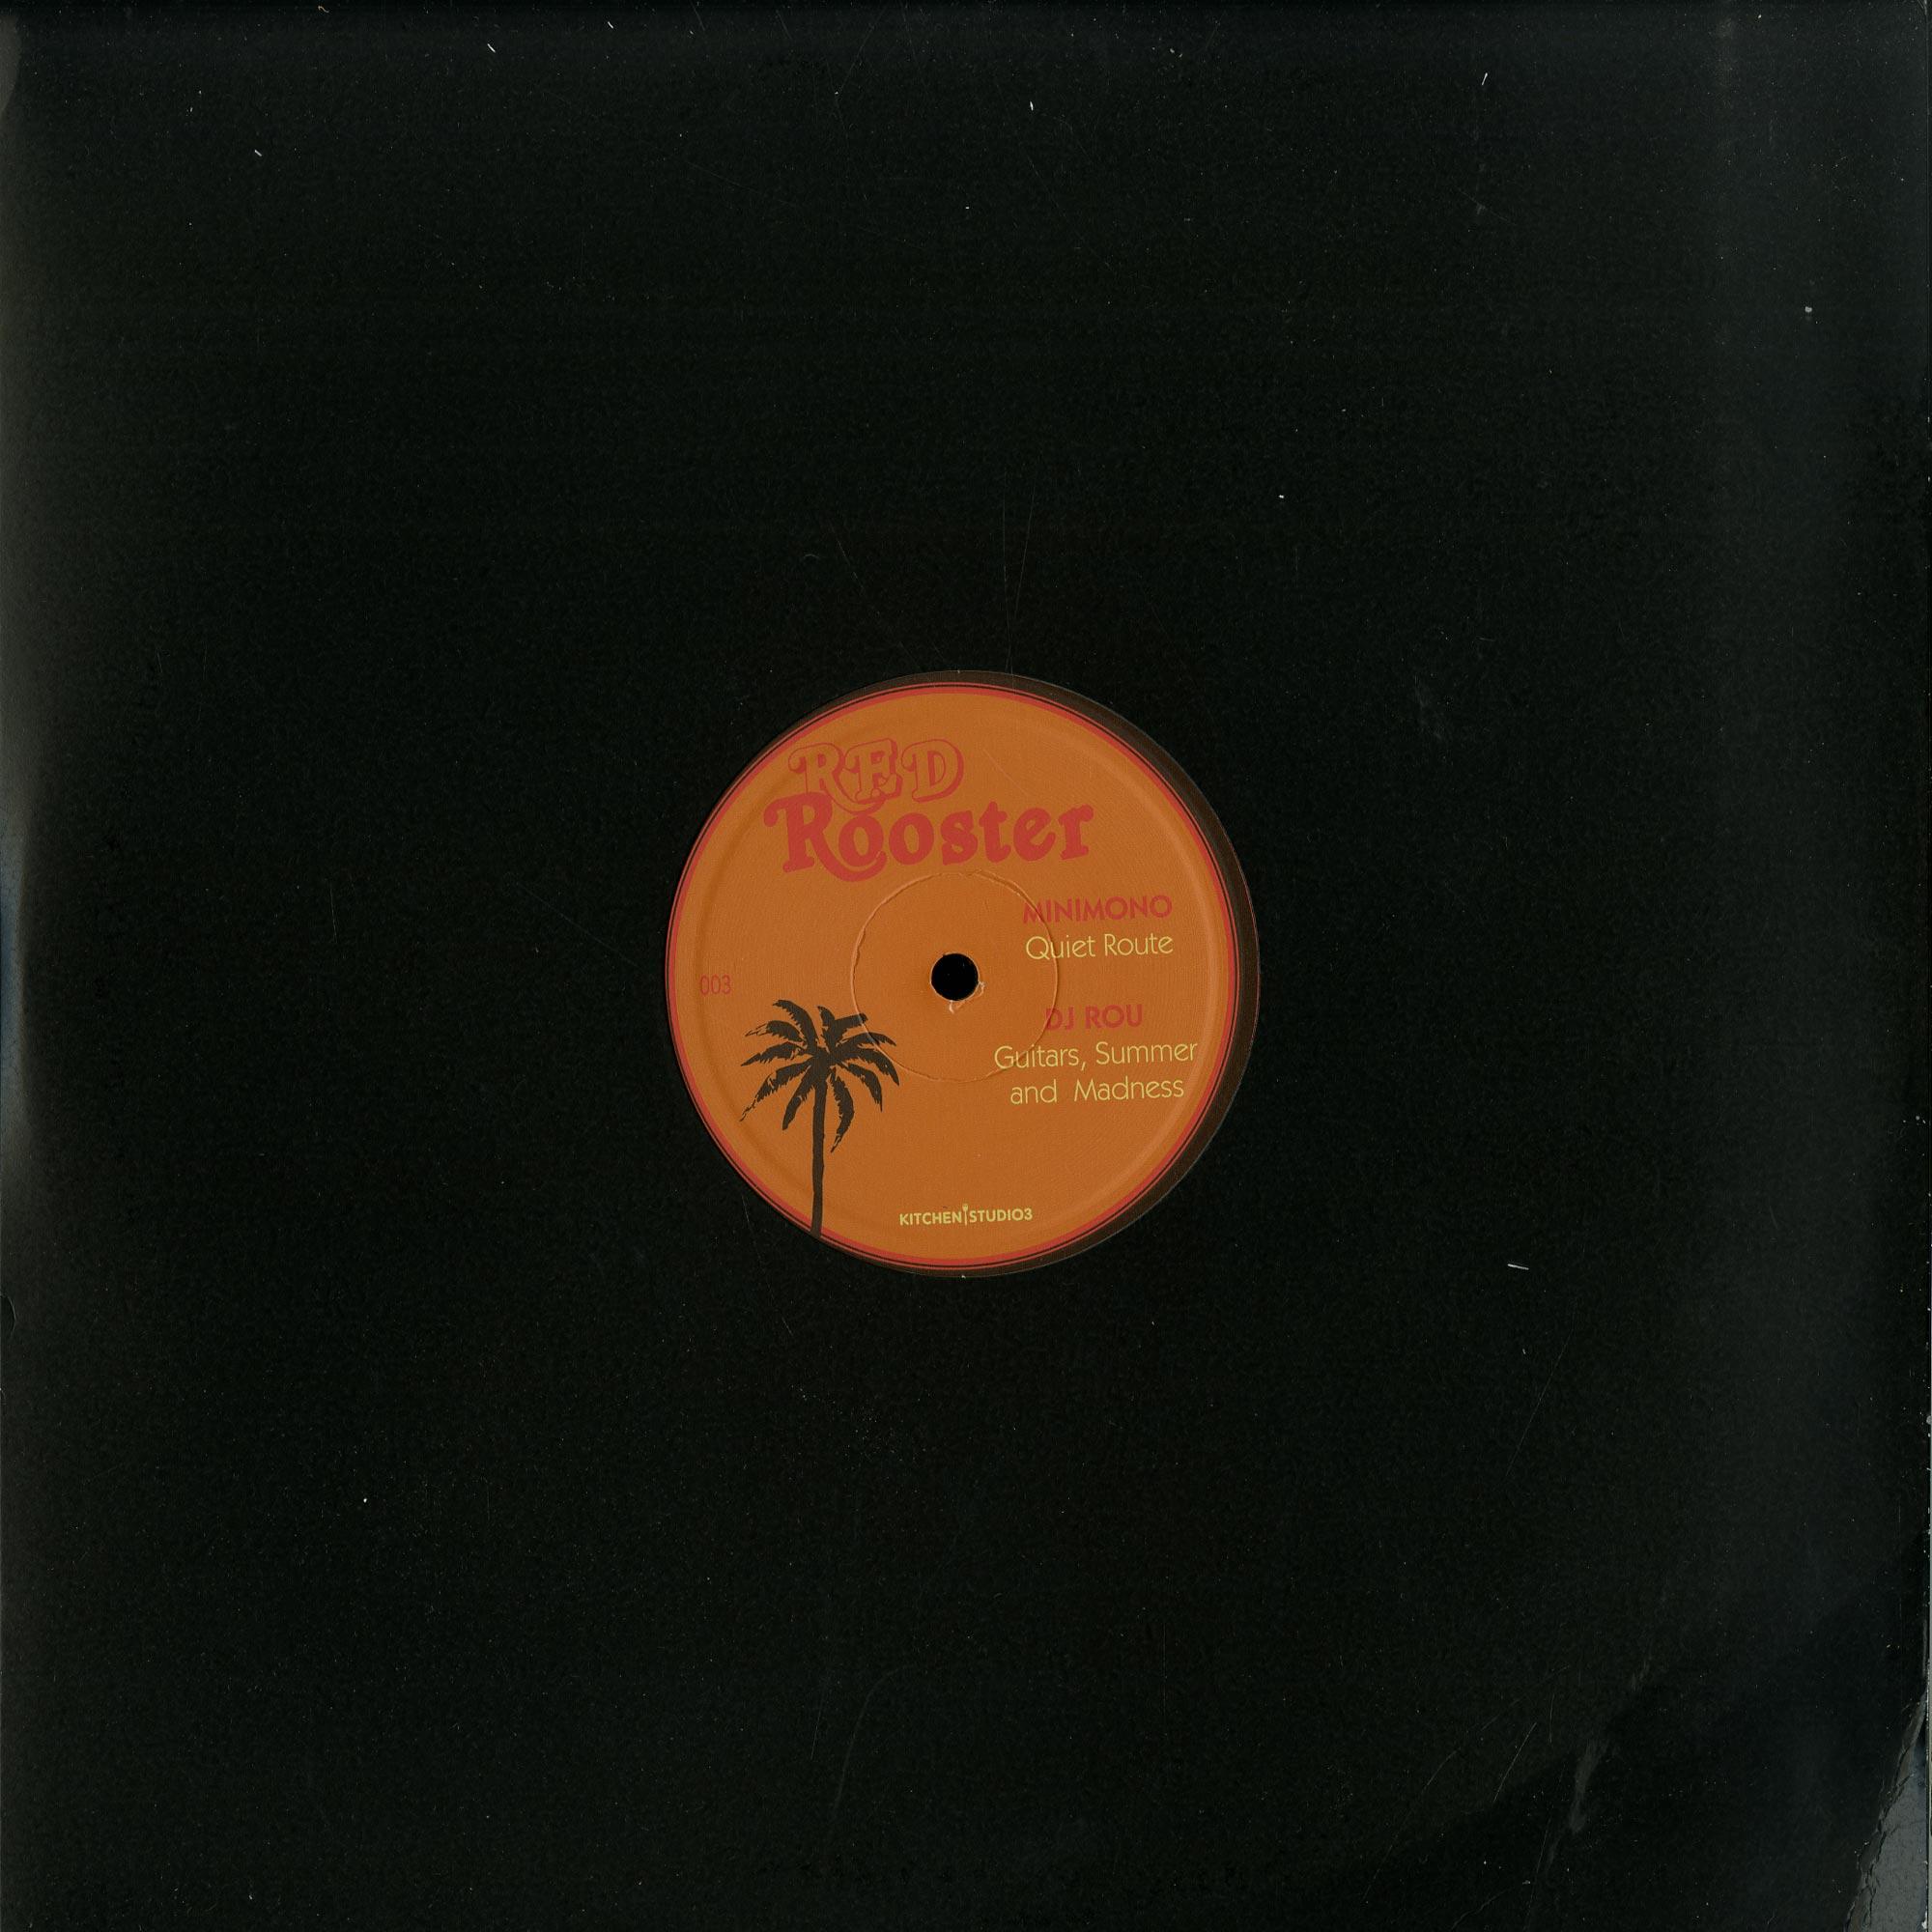 Minimono, DJ Rou, Memoryman, D Arabia - RED ROOSTER EP 003